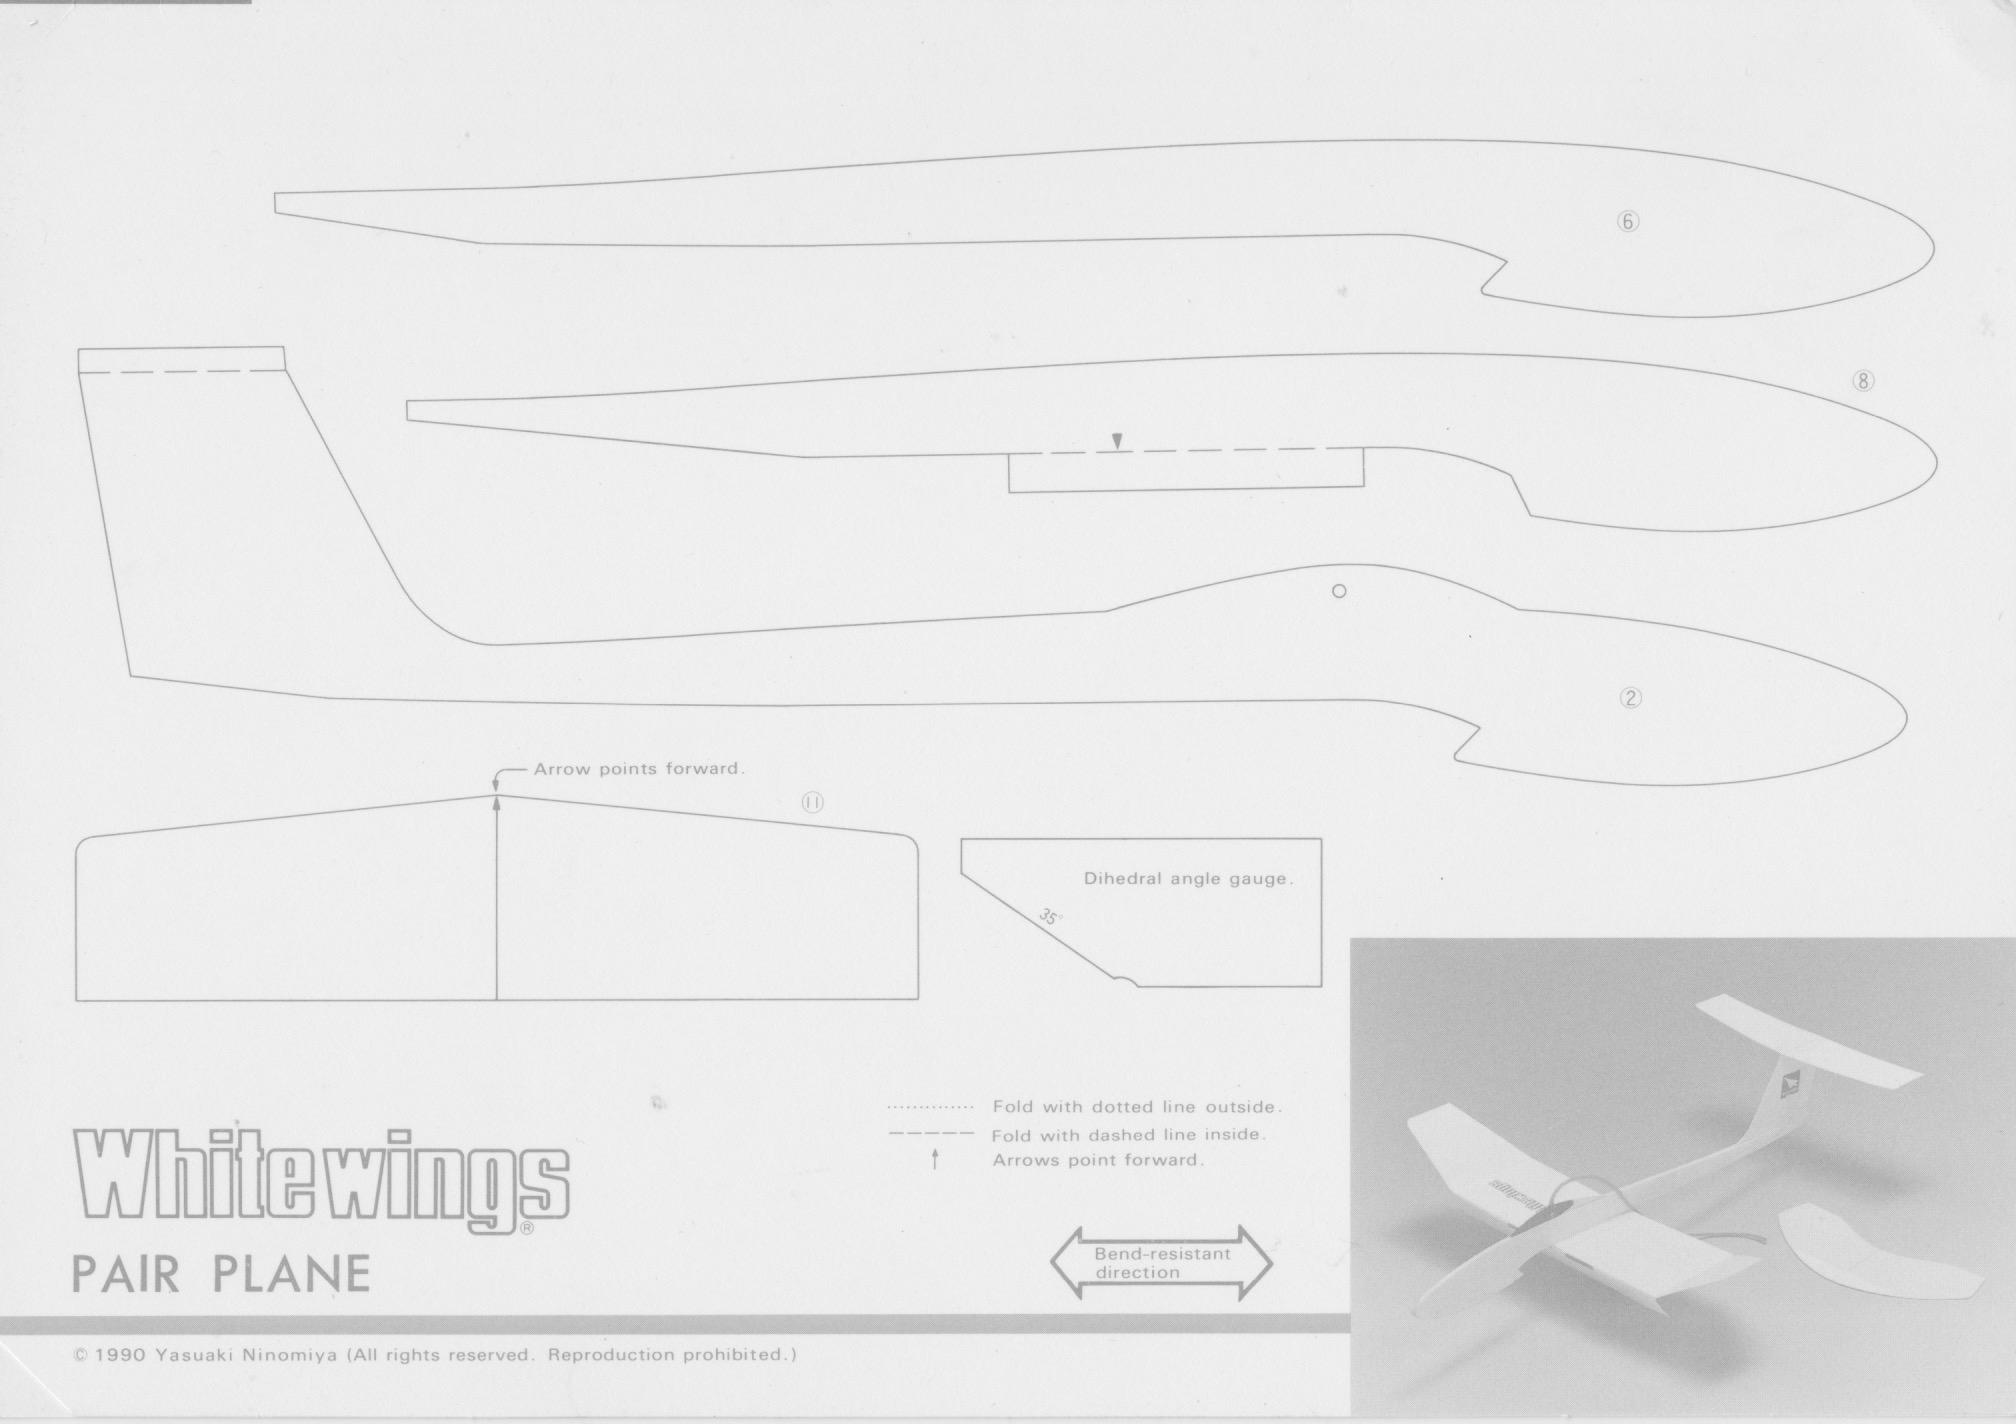 Pair_Plane_1.jpeg